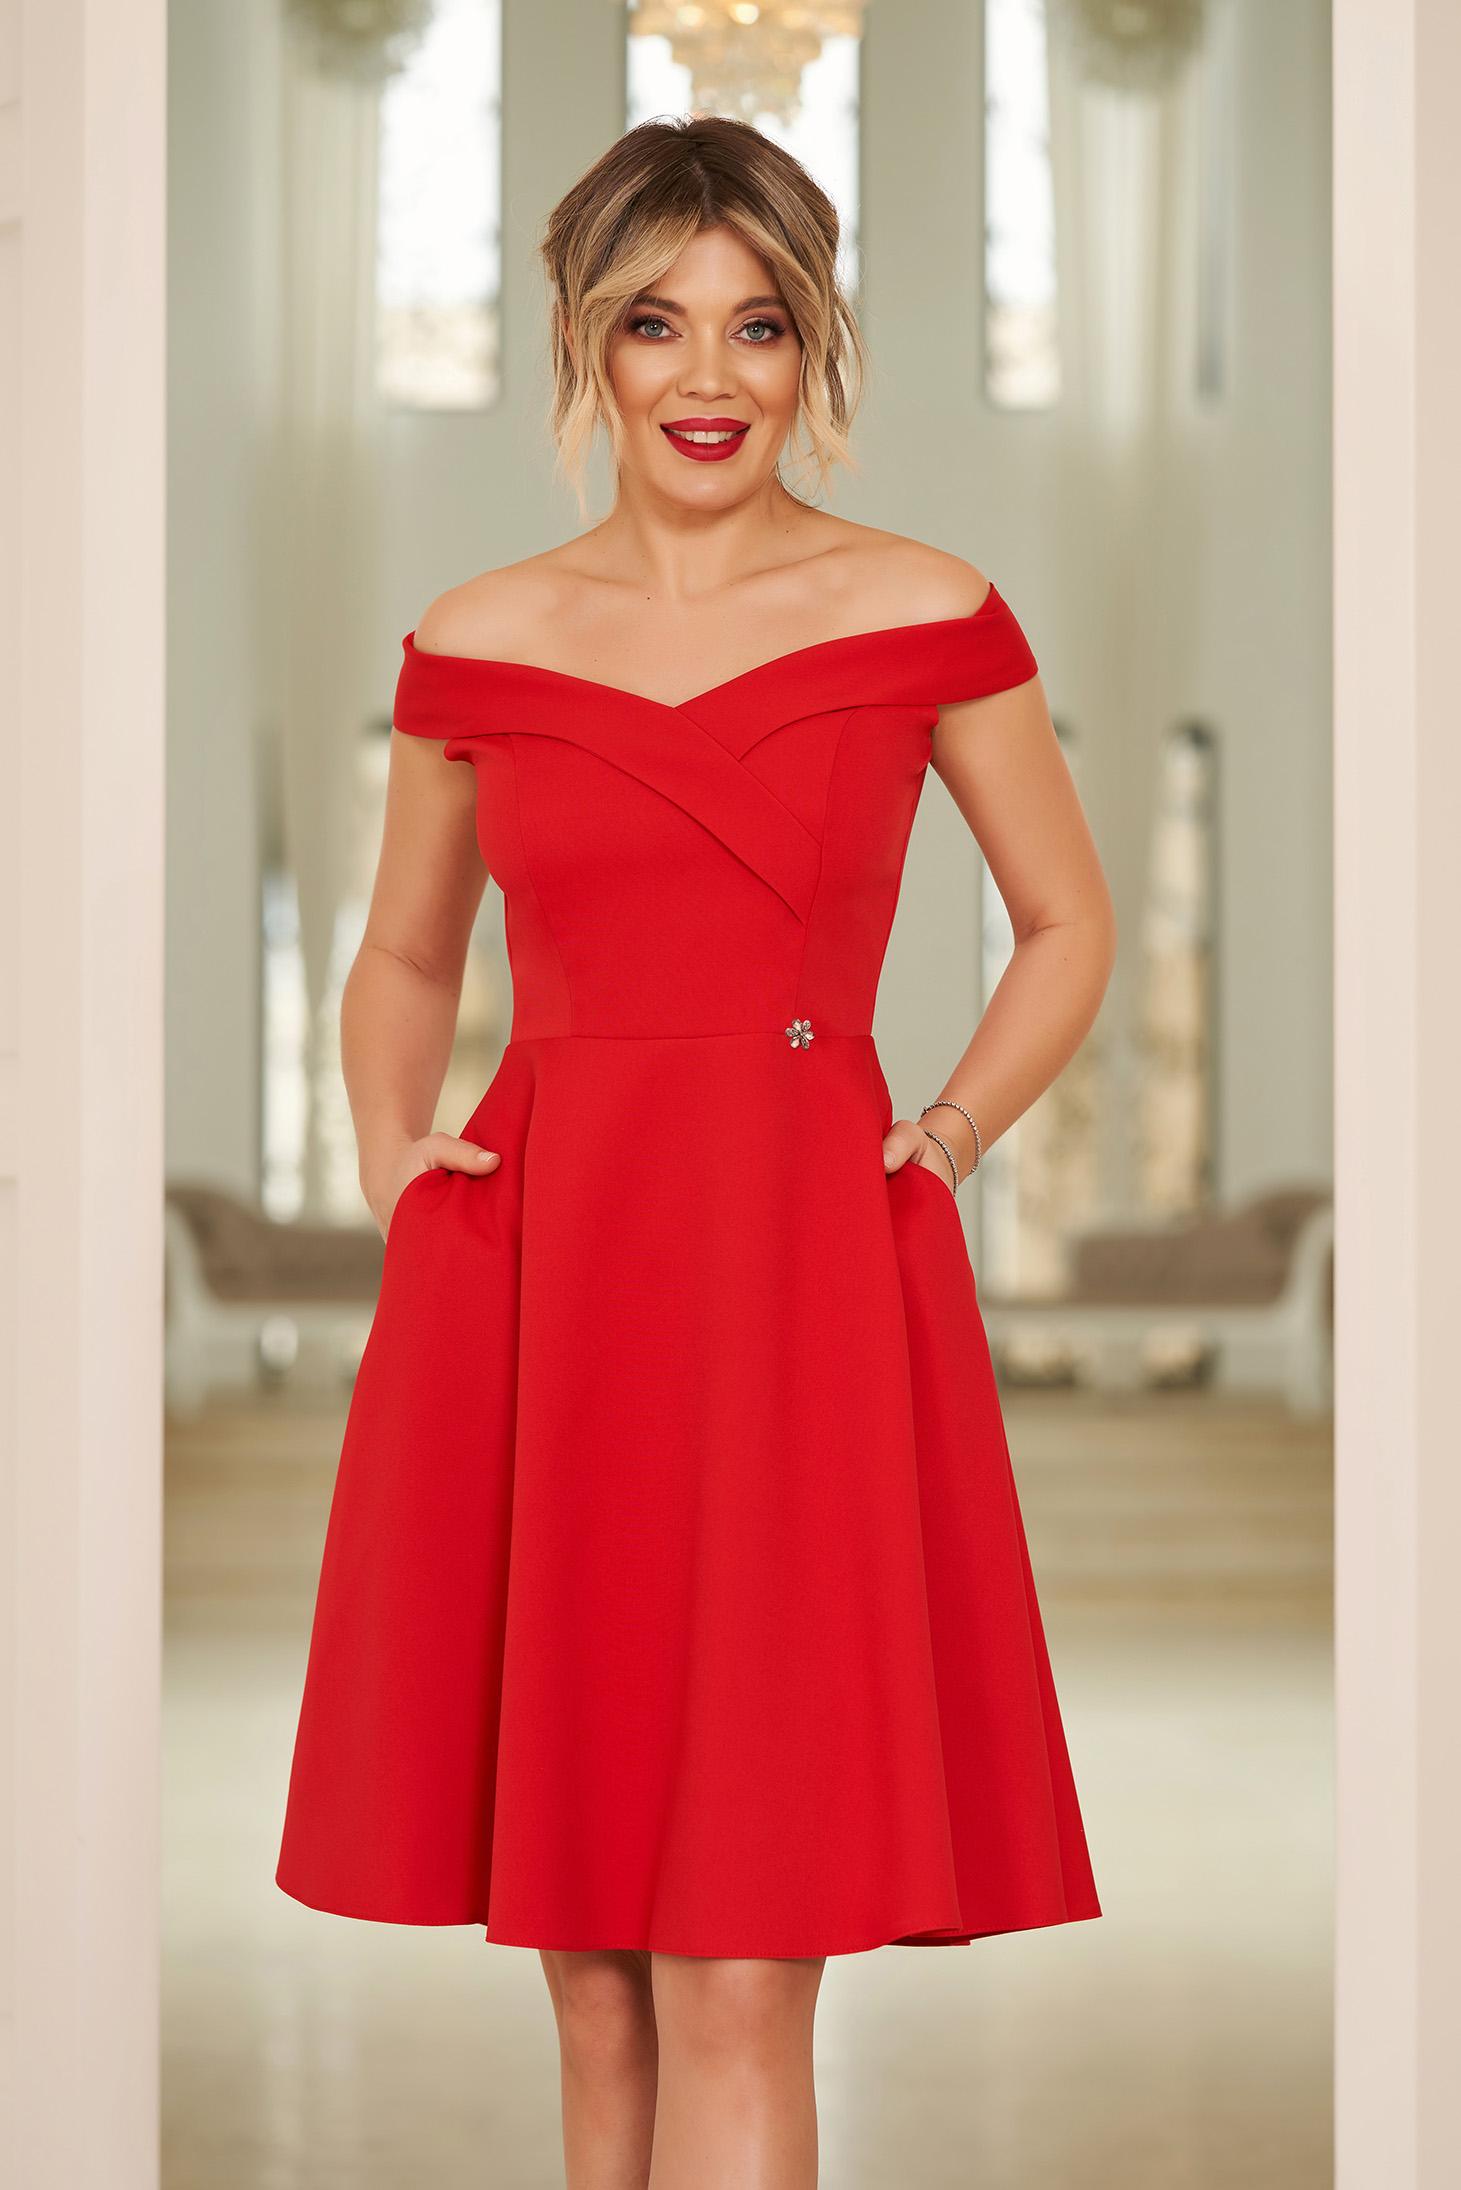 Rochie StarShinerS rosie de ocazie eleganta in clos cu decolteu cu umeri goi din stofa elastica subtire